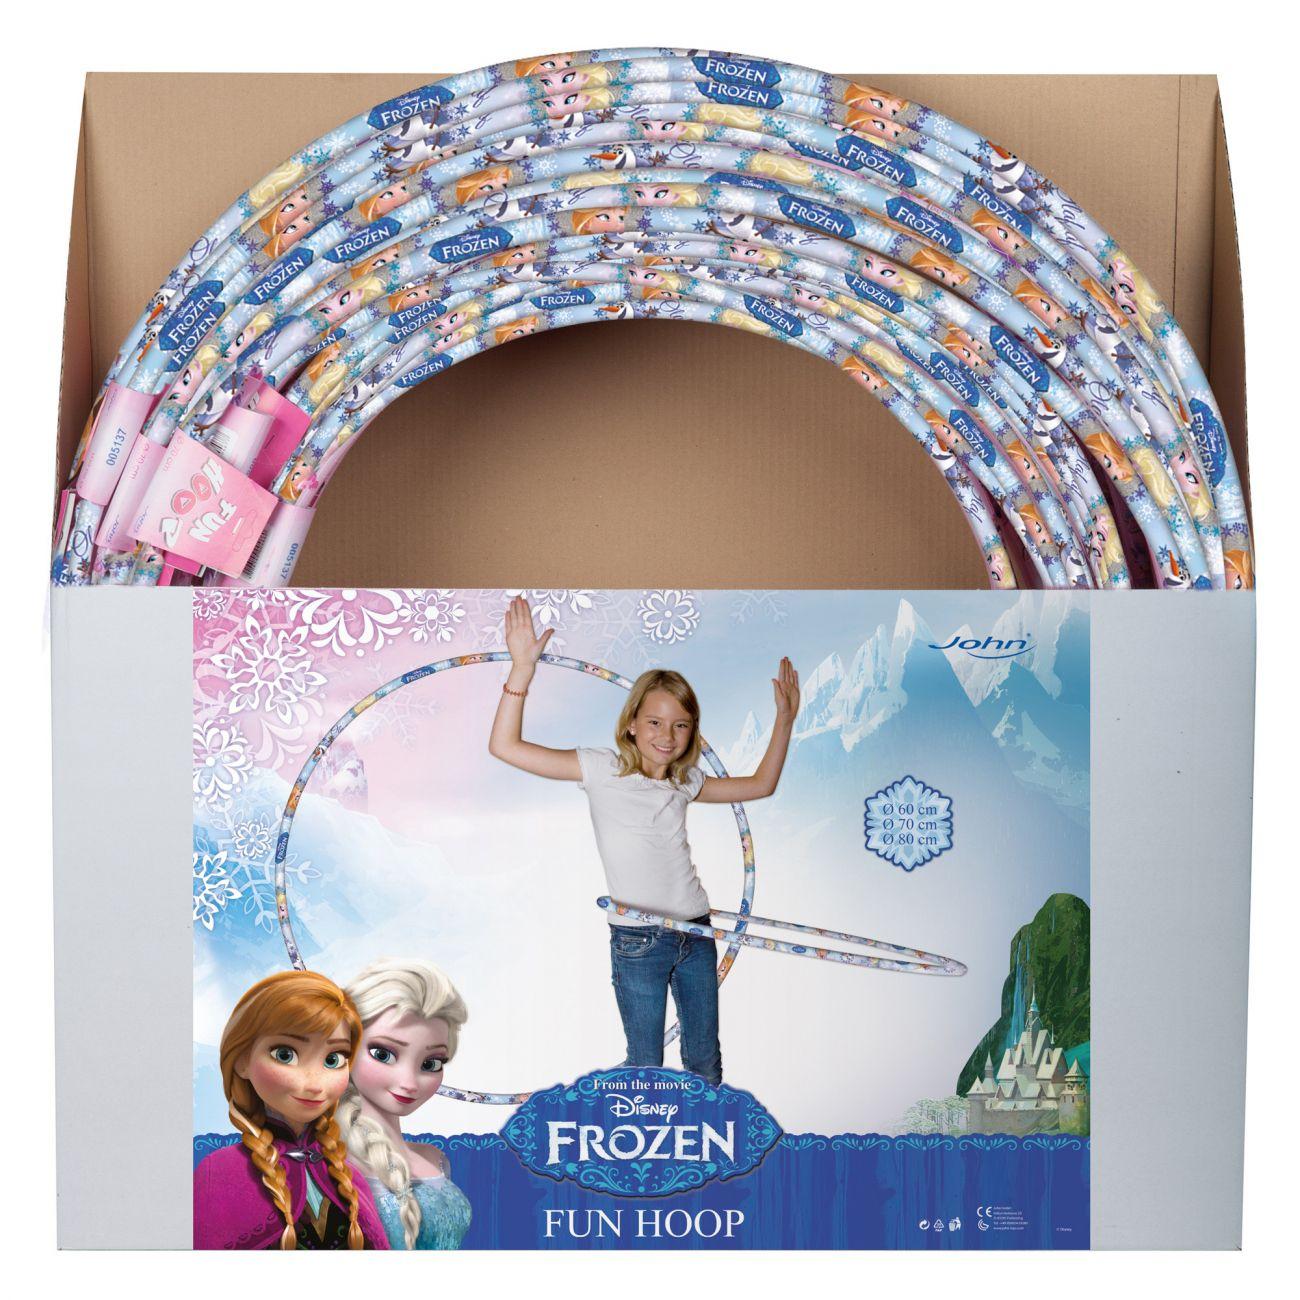 Hula-hop Frozen 60,70,80 cm